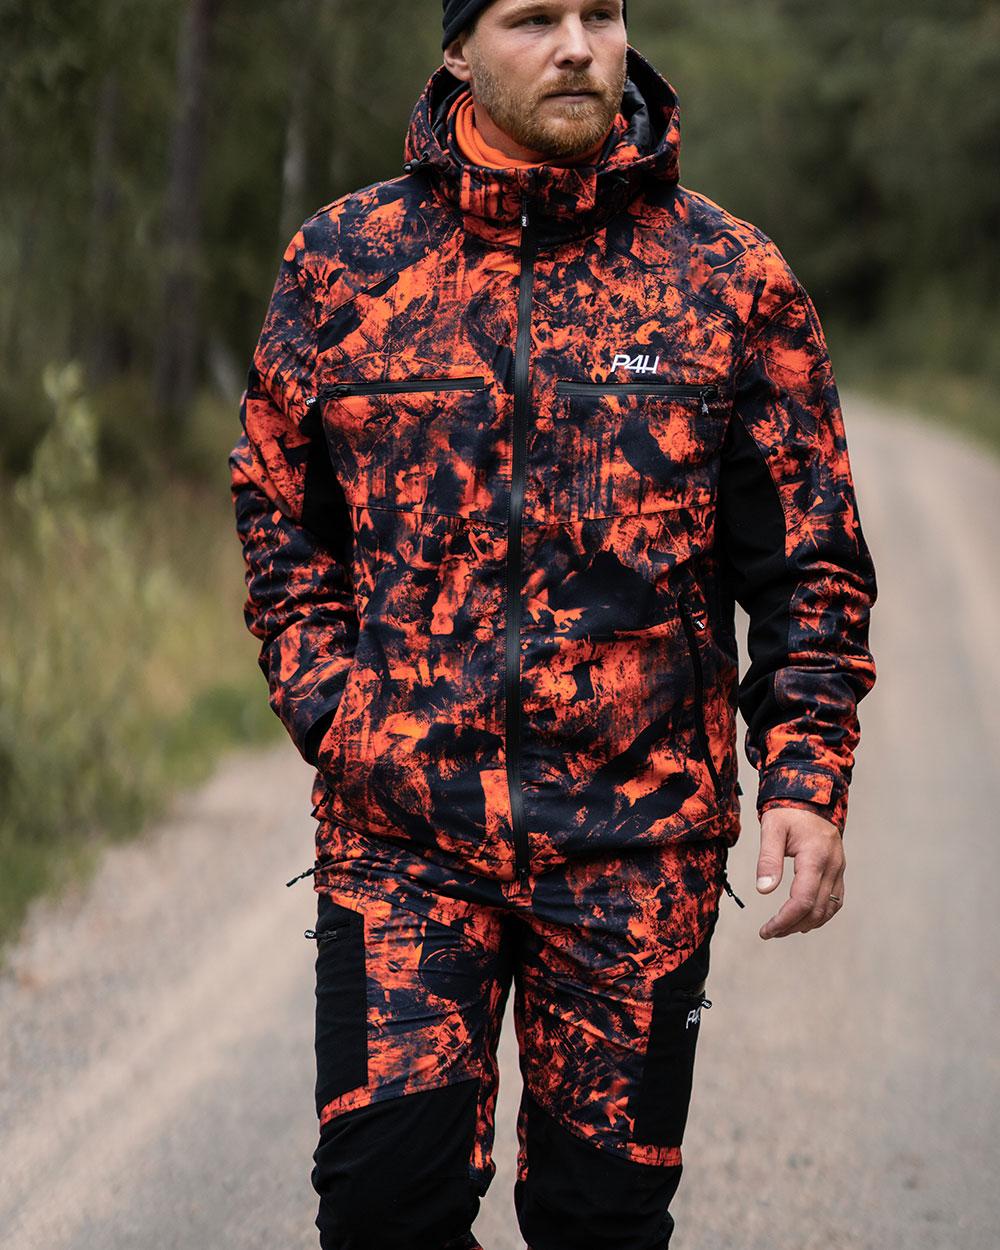 Jaktställ camouflage Herr, Hunters Elite - Orange Camo